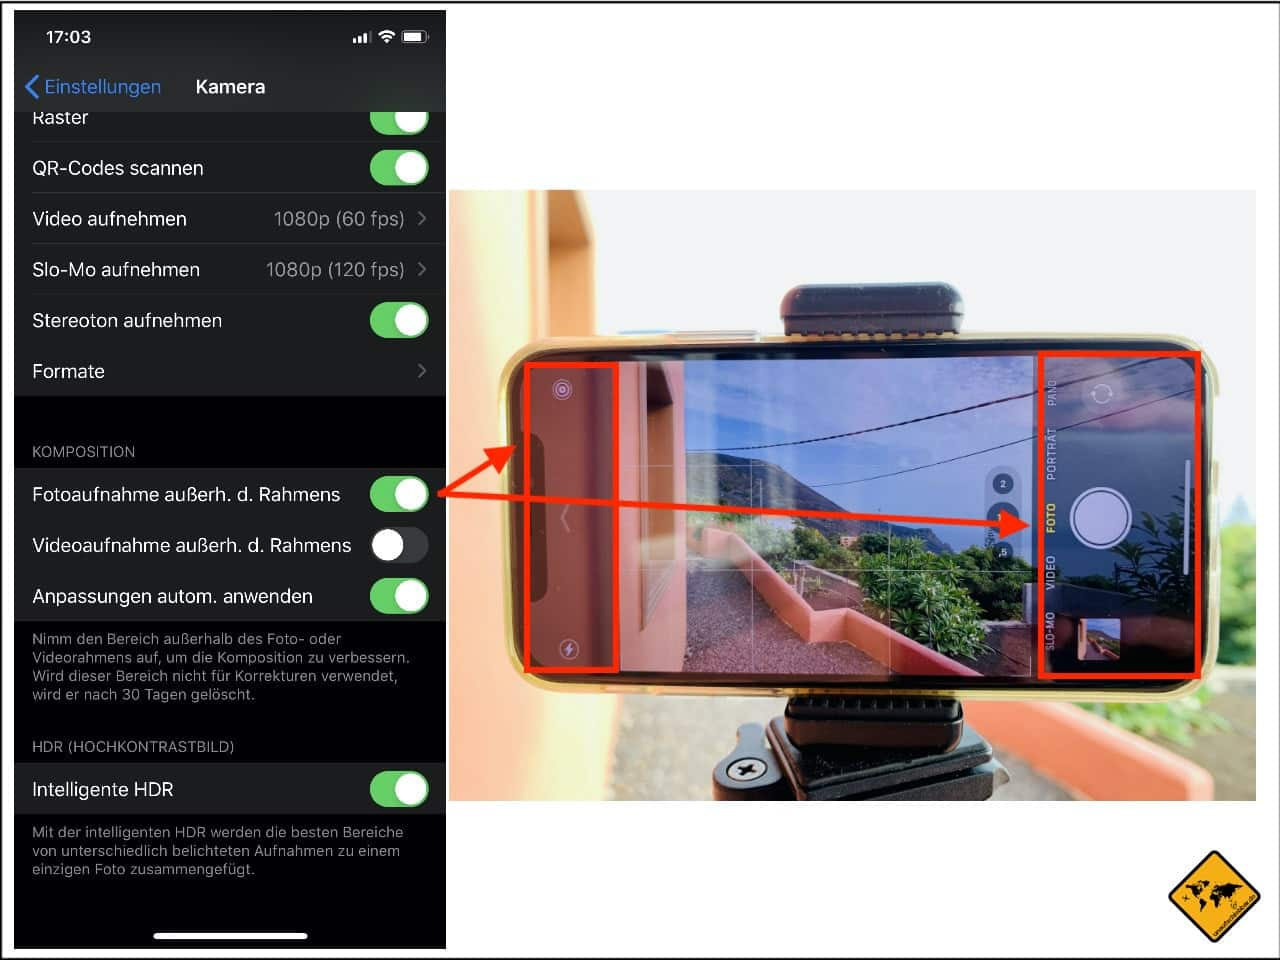 iPhone Aufnahmen außerhalb des Rahmens